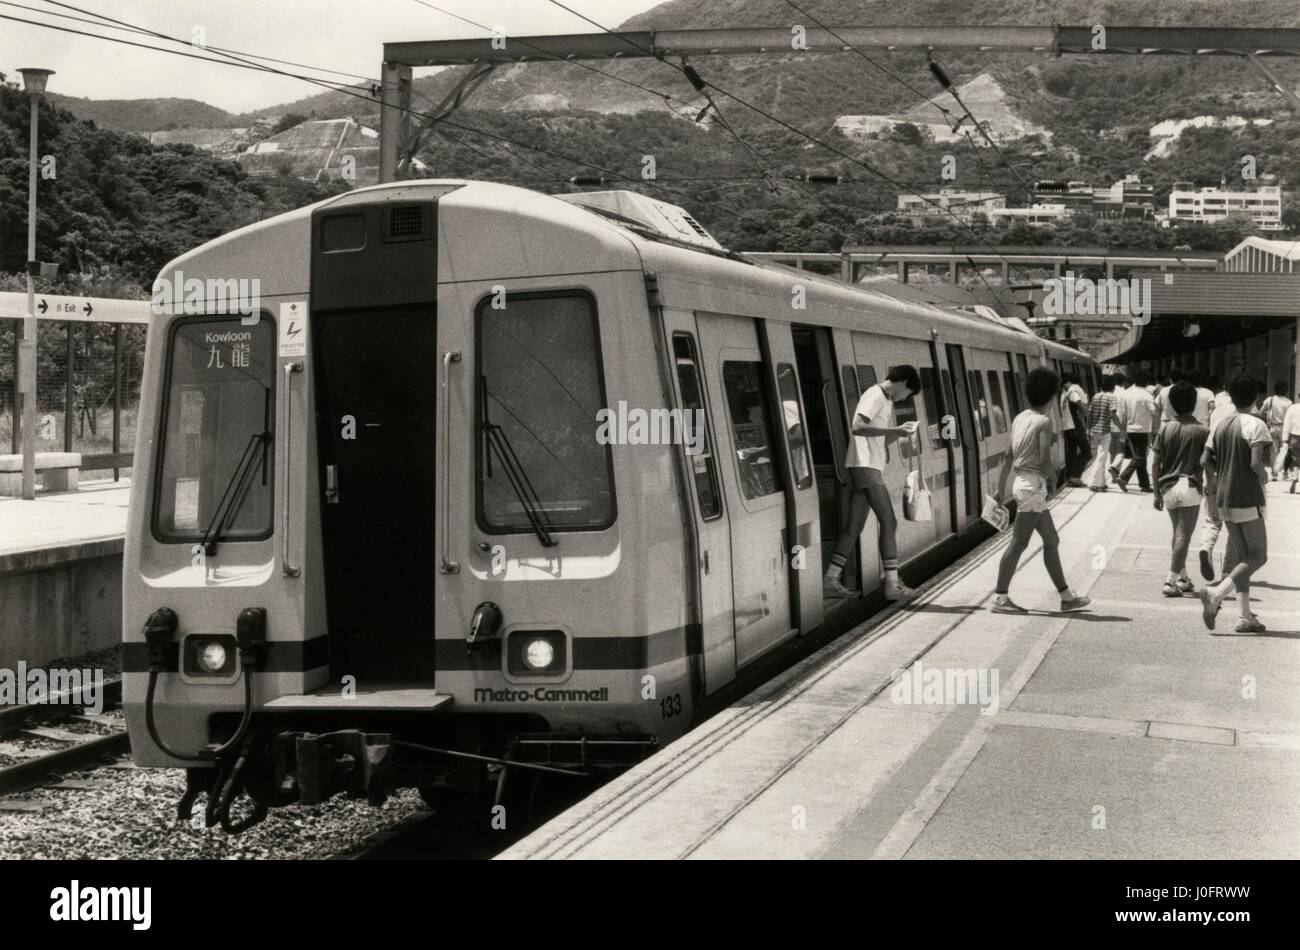 Train in service. Kowloon-Canton Railway. Hong Kong Stock Photo: 138030981 - Alamy